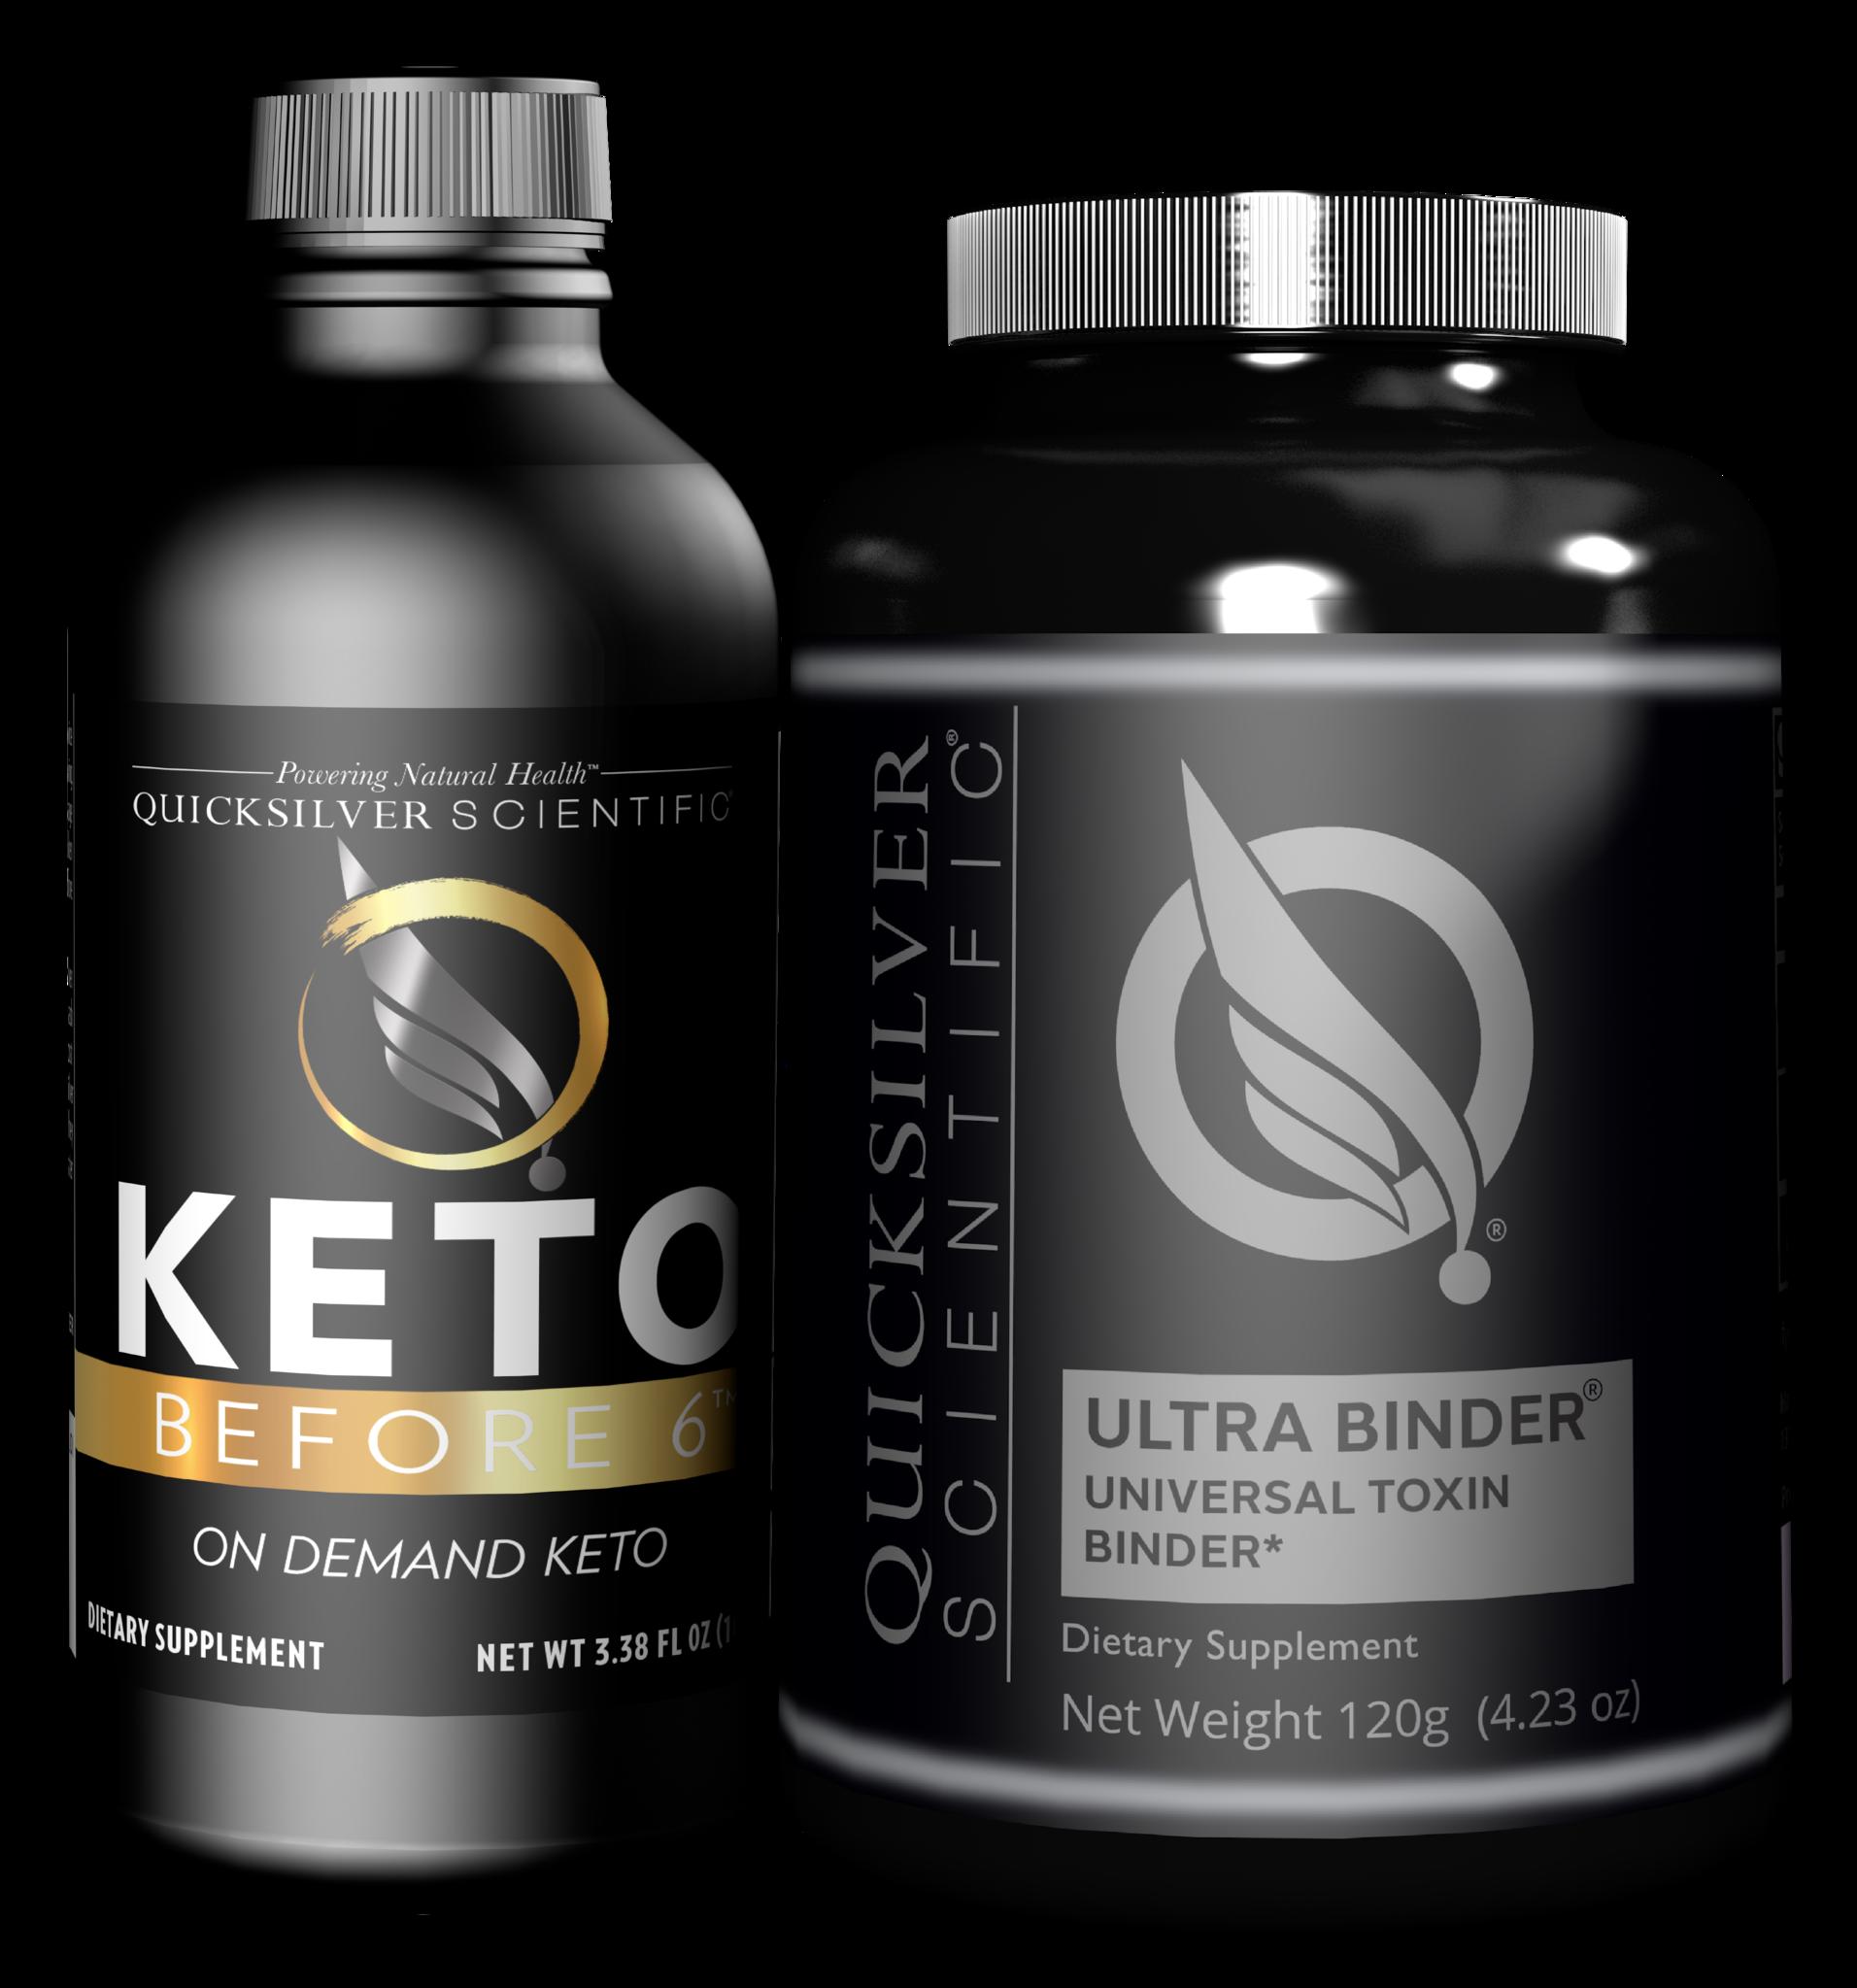 Quicksilver Scientific Keto Before 6™ Detox Kit